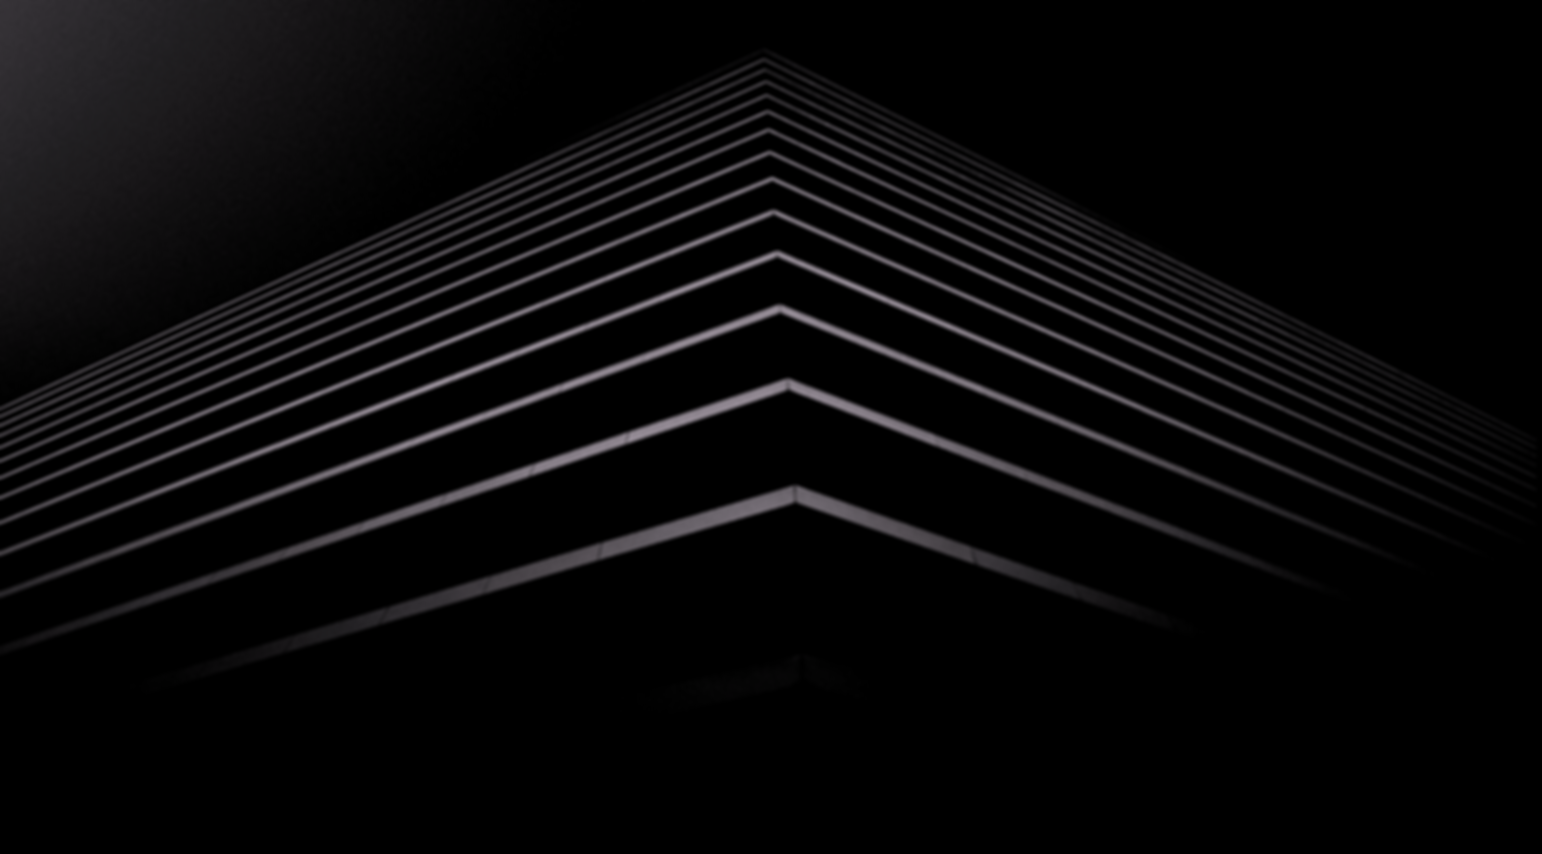 Zrzut ekranu 2020-03-30 20.03.46.png